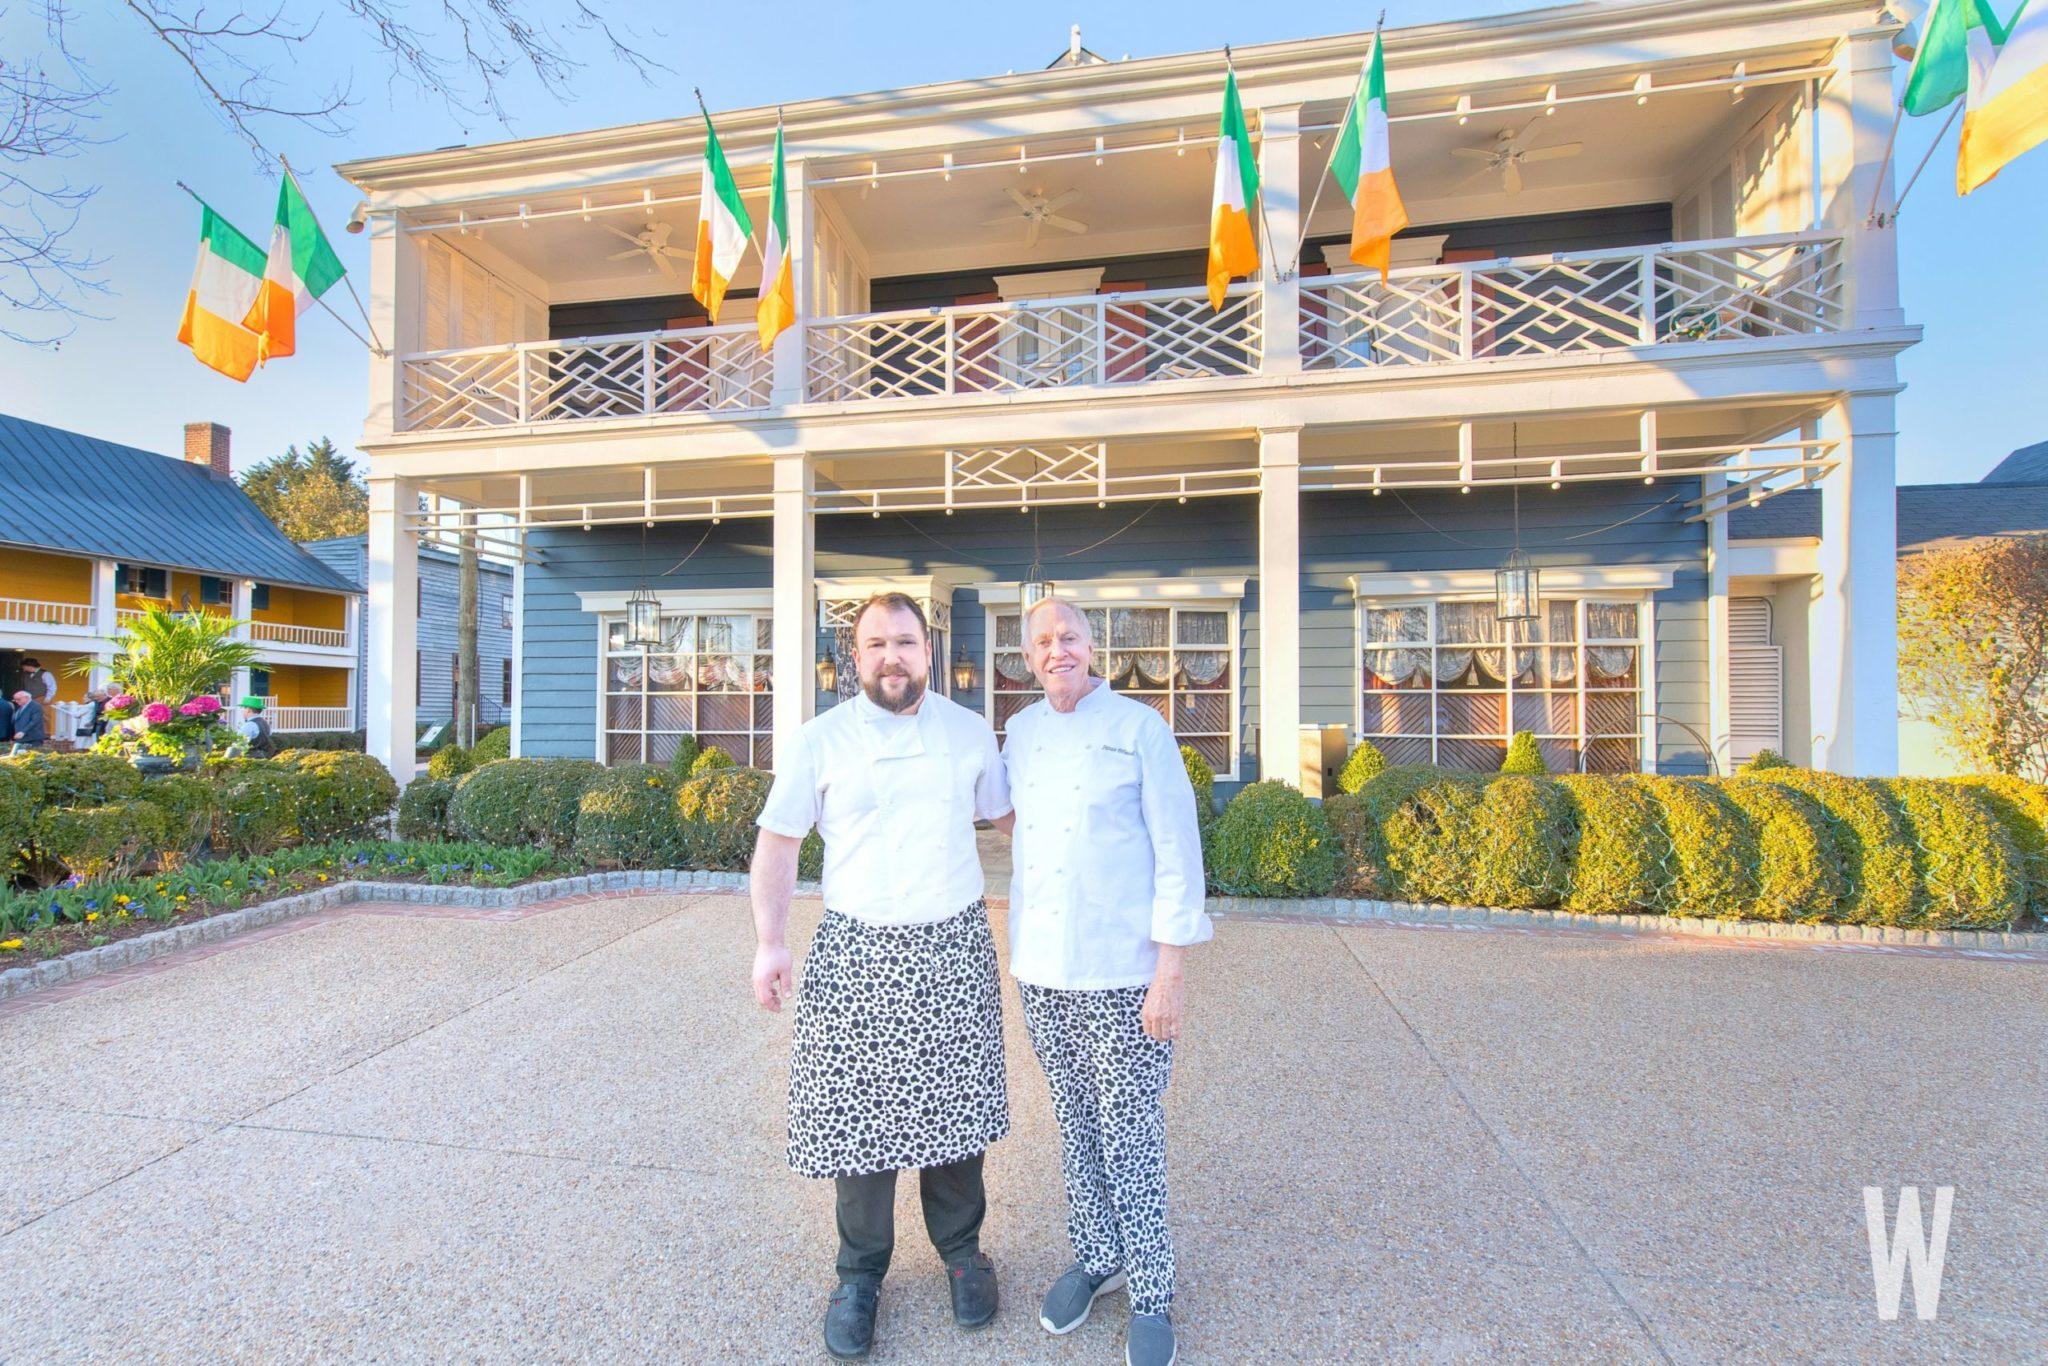 PHOTOS: The Inn at Little Washington's Saint Patrick's Day Dinner